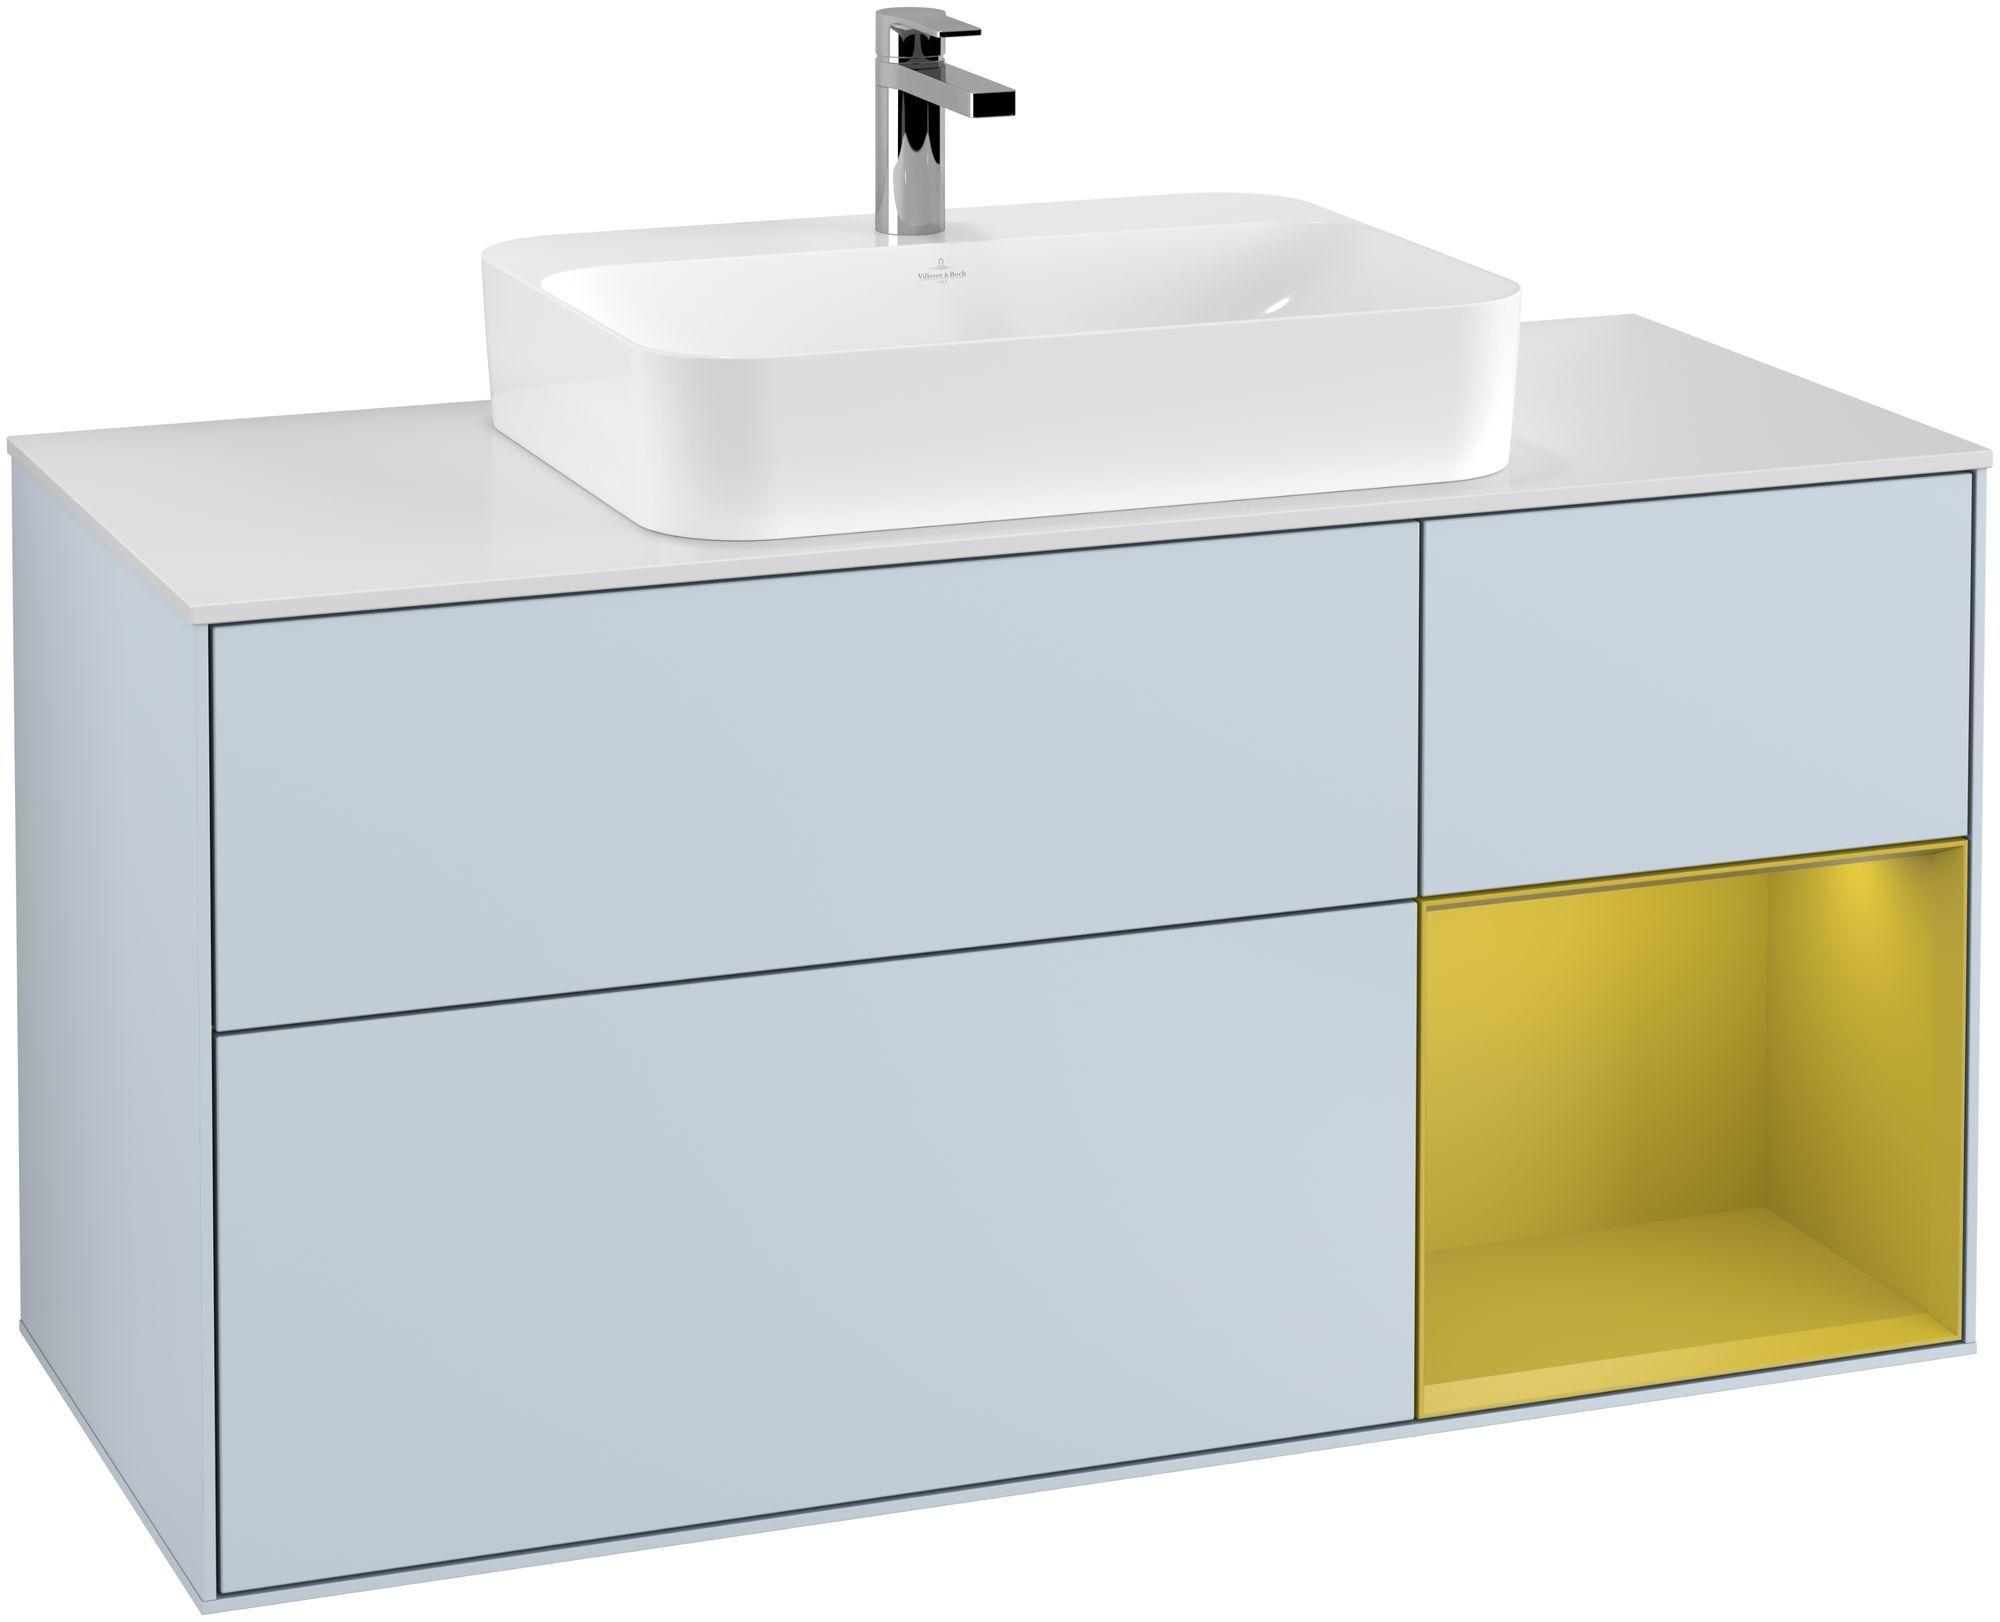 Villeroy & Boch Finion G42 Waschtischunterschrank mit Regalelement 3 Auszüge Waschtisch mittig LED-Beleuchtung B:120xH:60,3xT:50,1cm Front, Korpus: Cloud, Regal: Sun, Glasplatte: White Matt G421HEHA